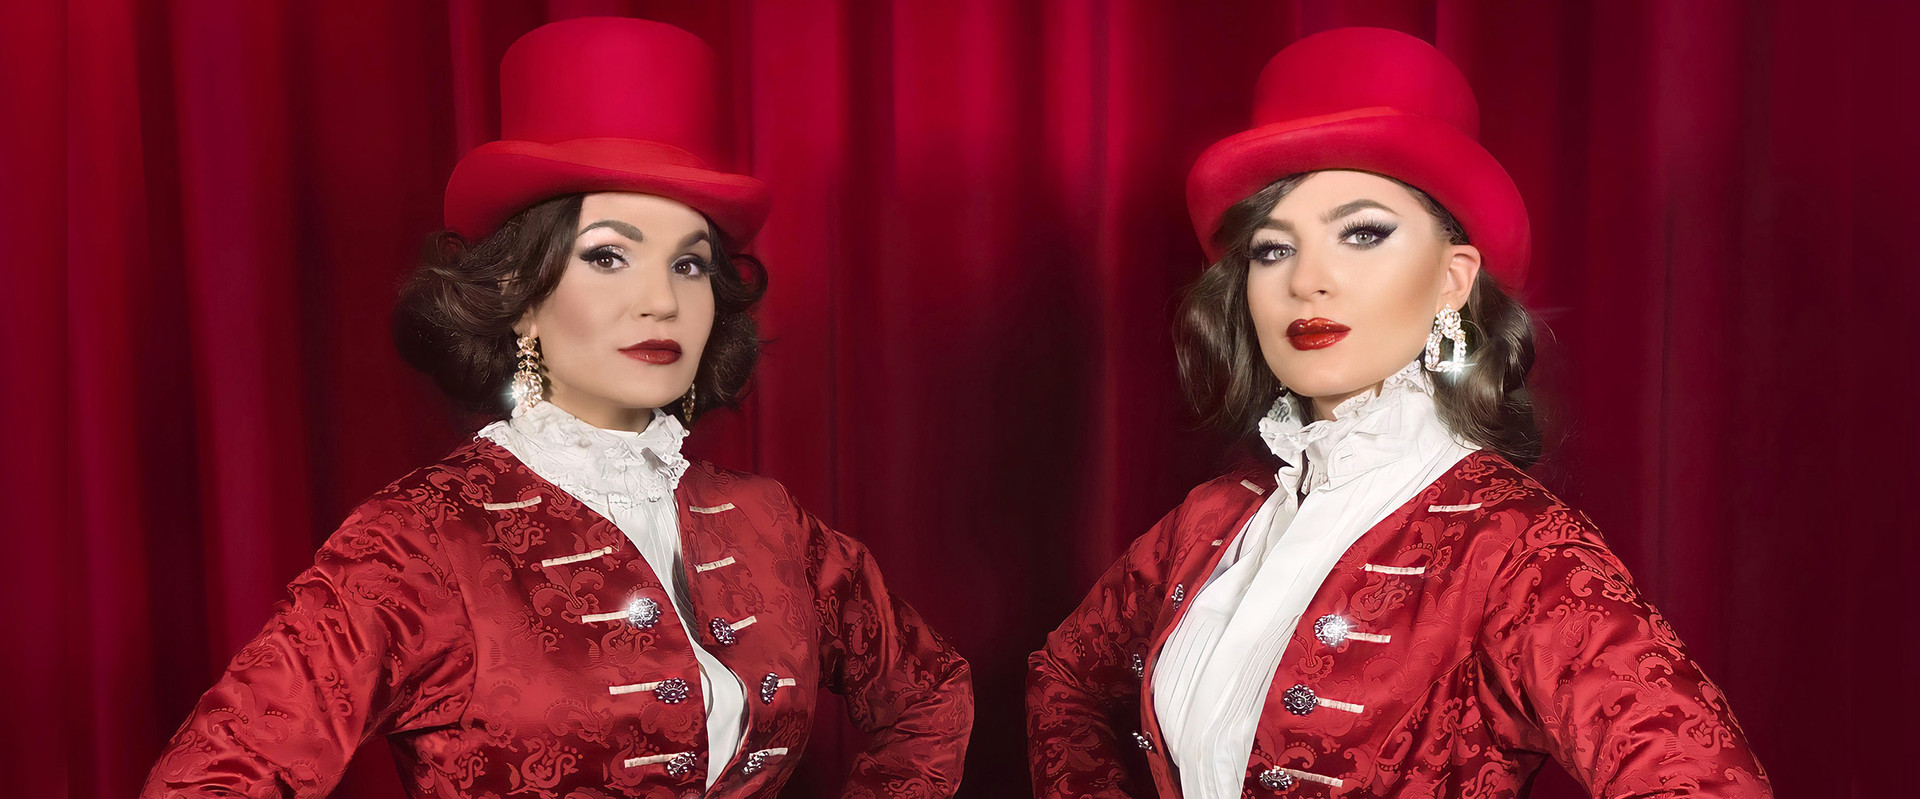 Cabaret Sisters